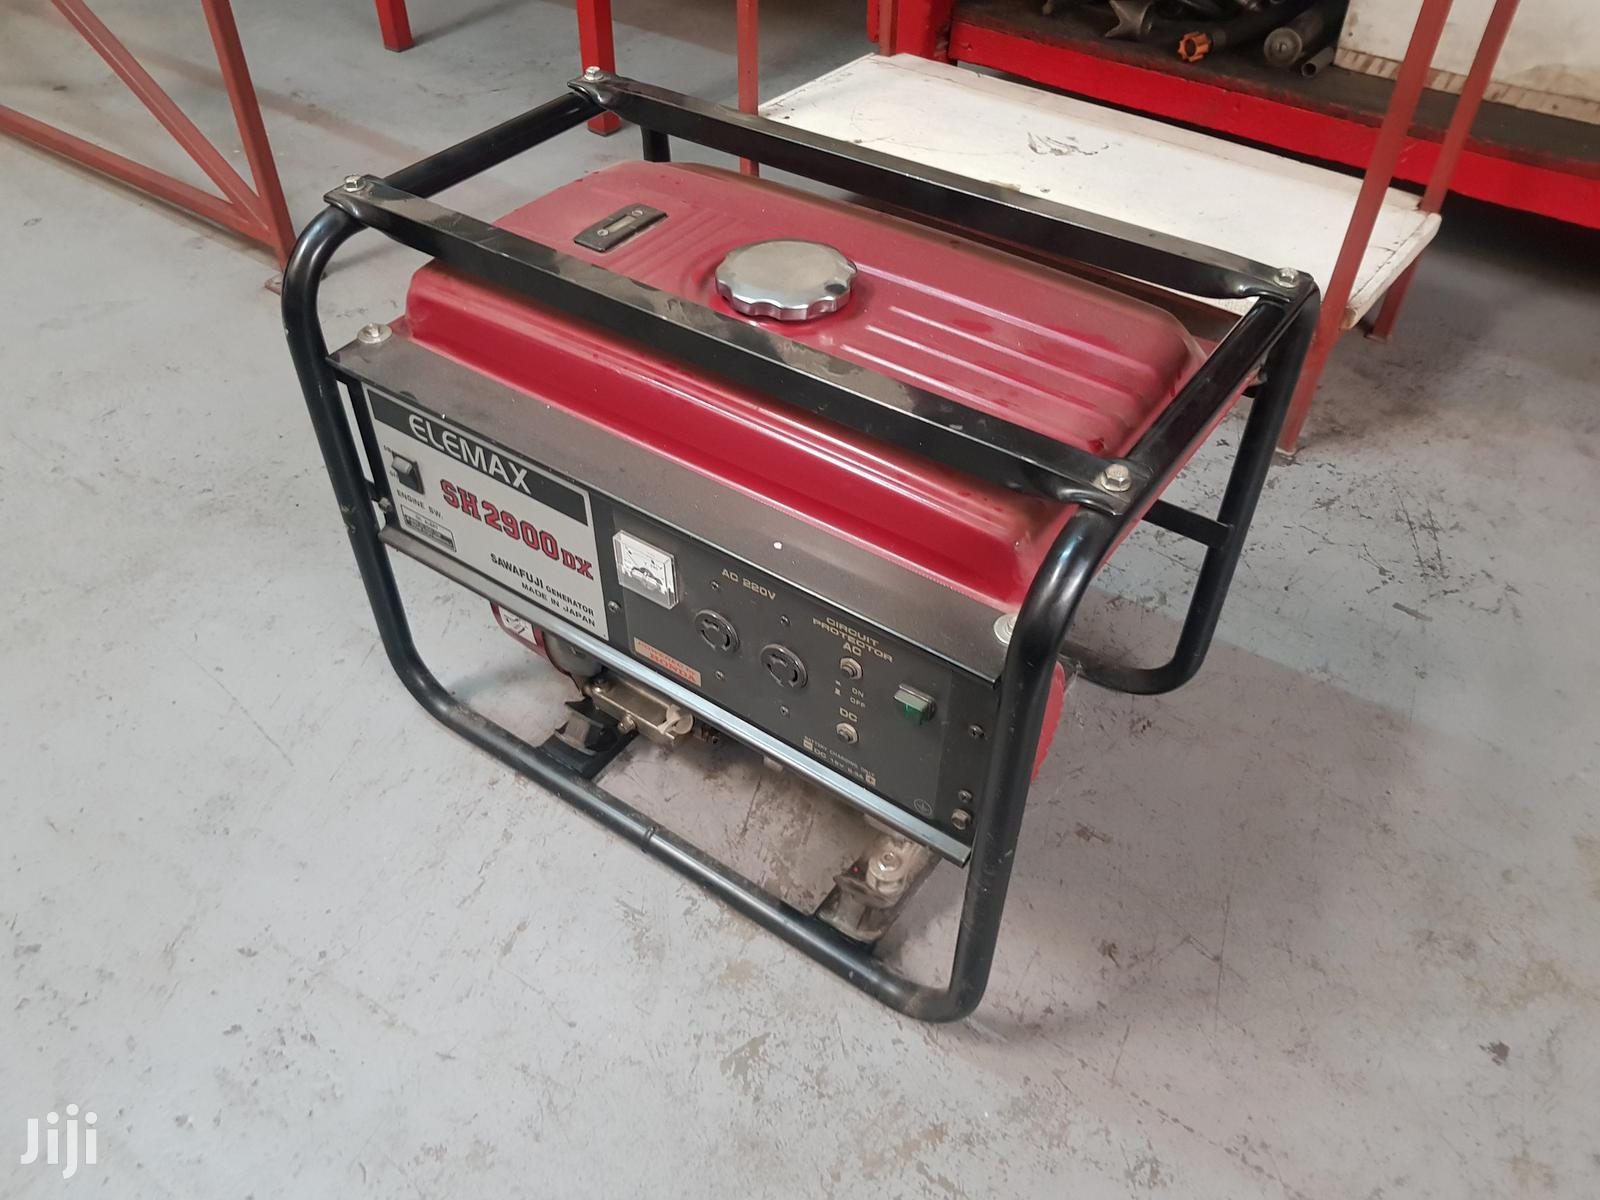 Honda Elemax SH2900DX Generator For Sale   Electrical Equipment for sale in Nairobi South, Nairobi, Kenya